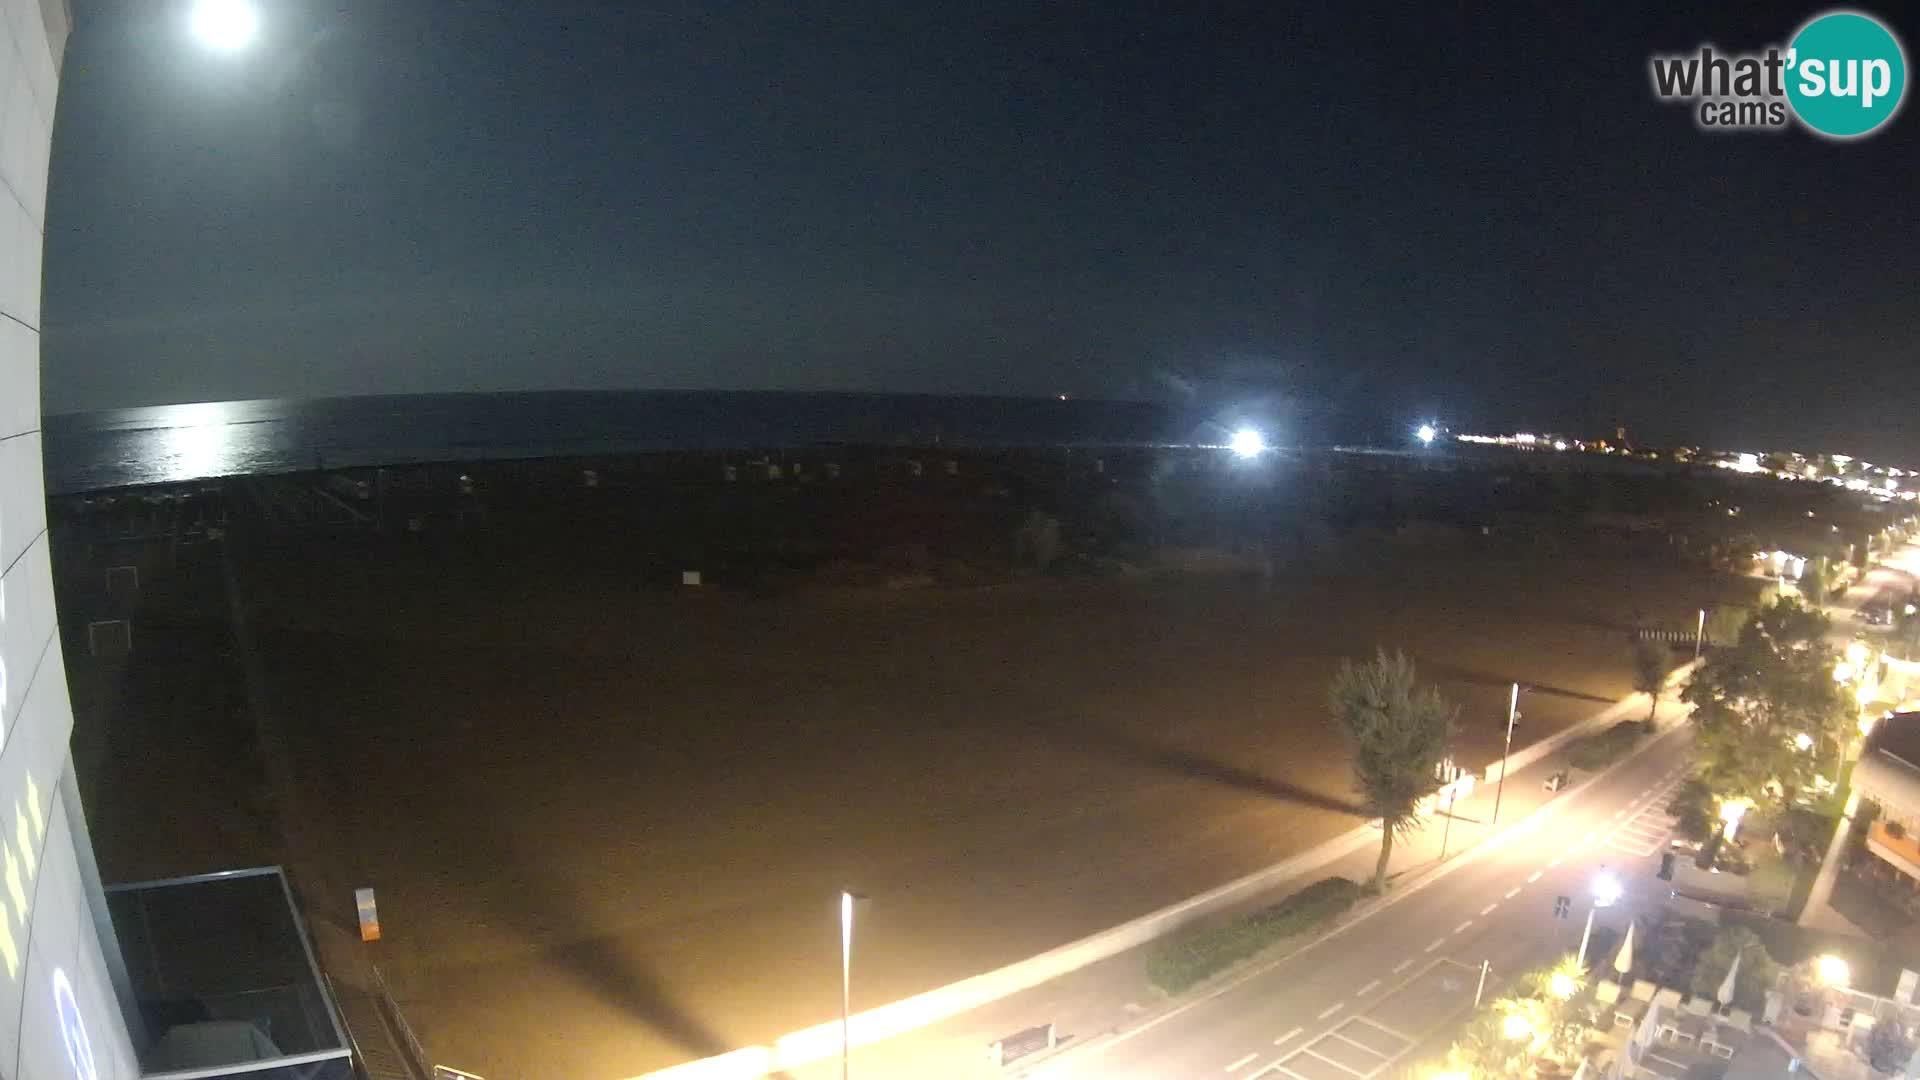 Hotel Panoramic en vivo Caorle playa Levante webcam – Italia